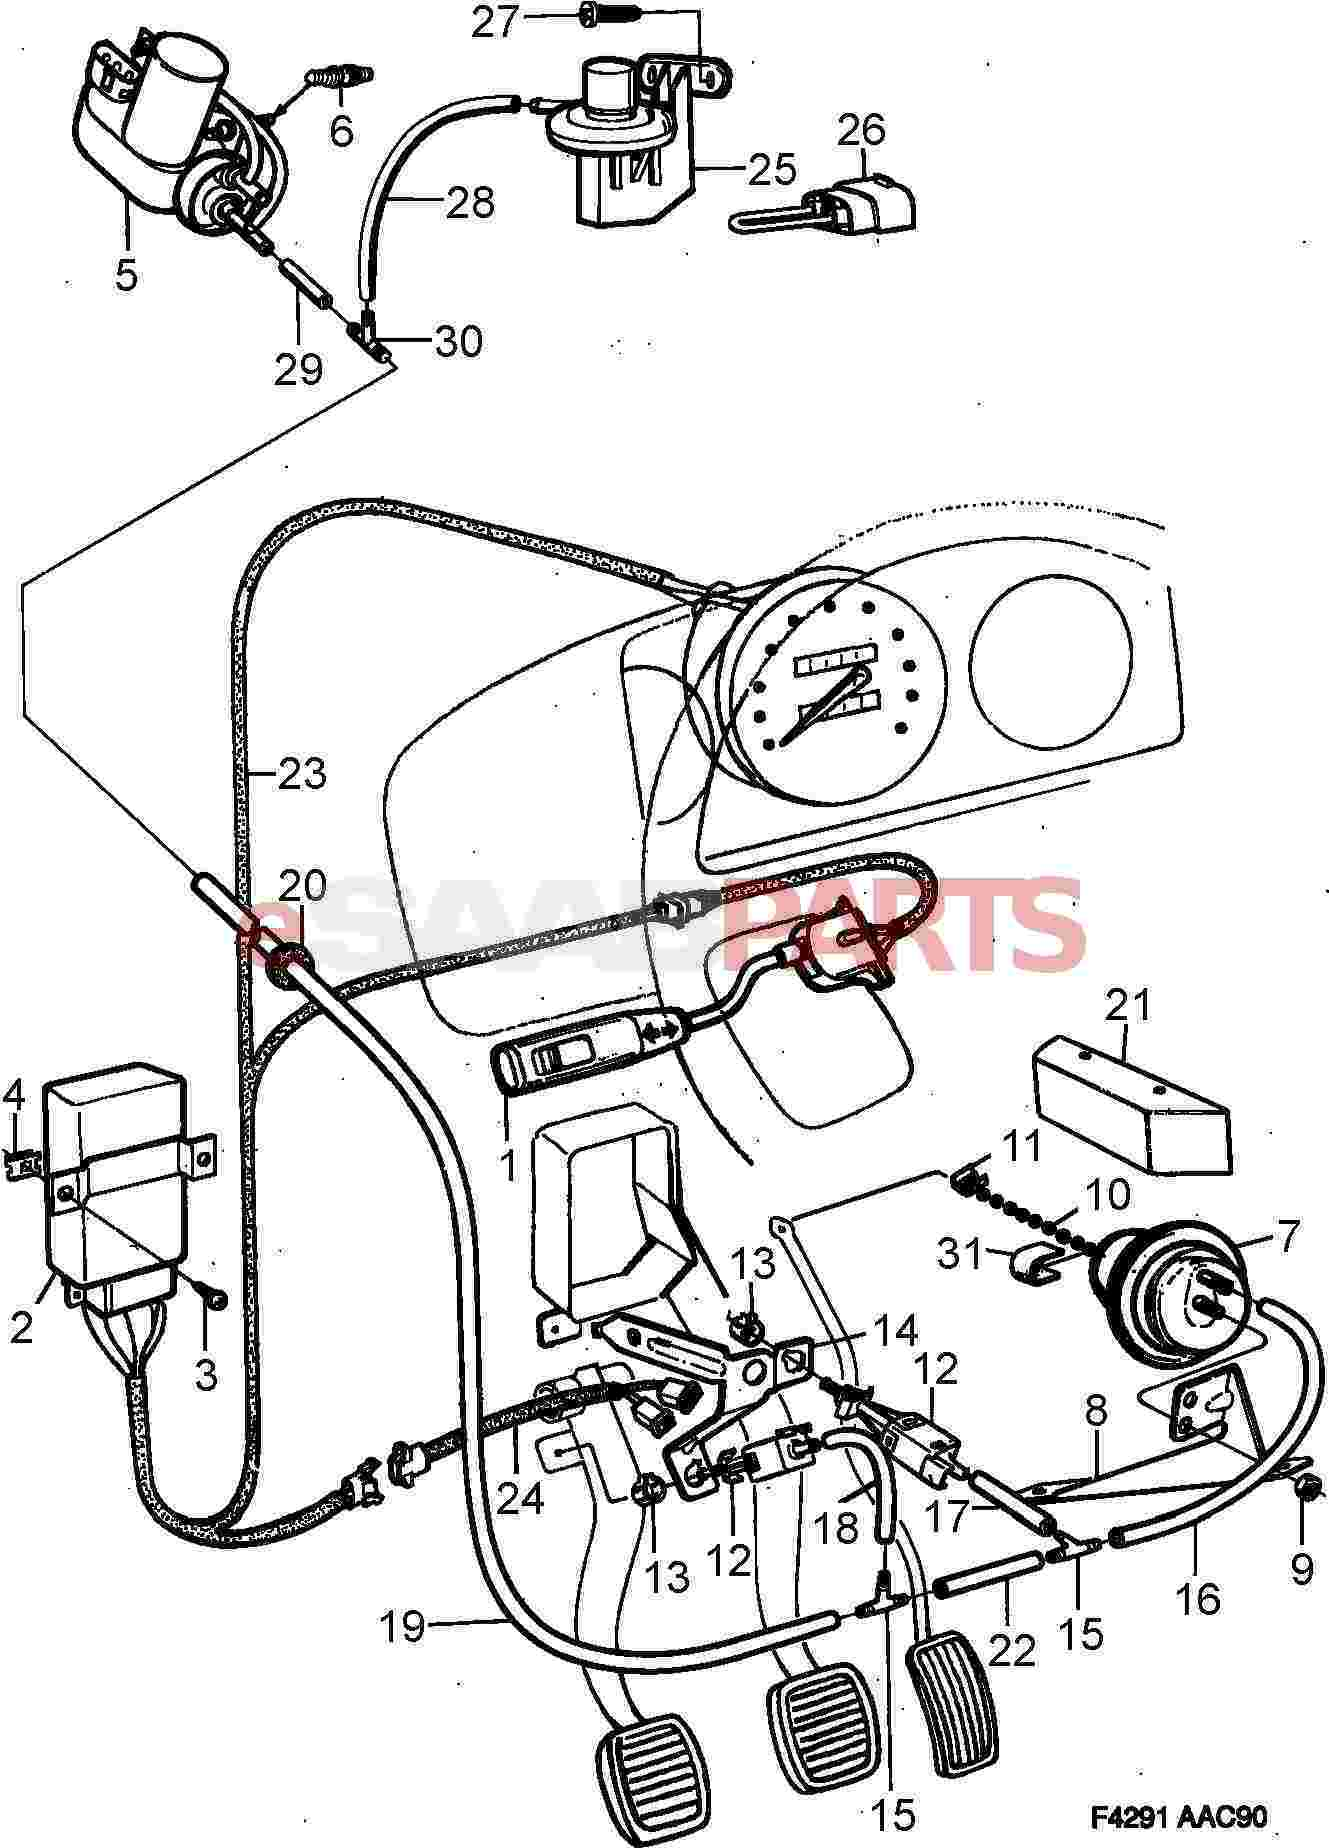 8587024 saab vacuum pump genuine saab parts from esaabparts com rh esaabparts com Ford Cruise Control Diagram GM Cruise Control Wiring Diagram